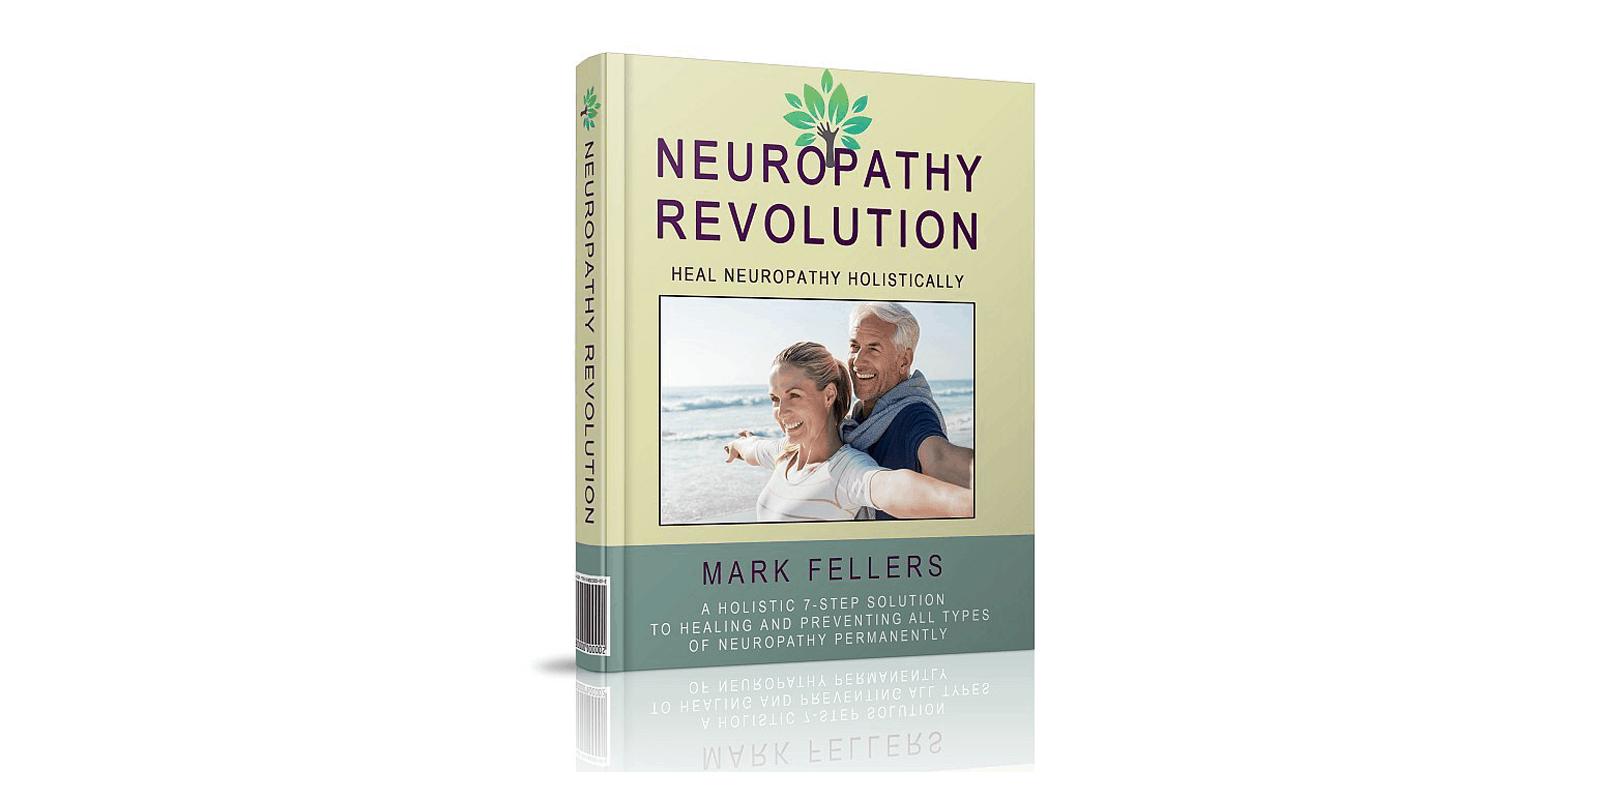 Author of Neuropathy Revolution